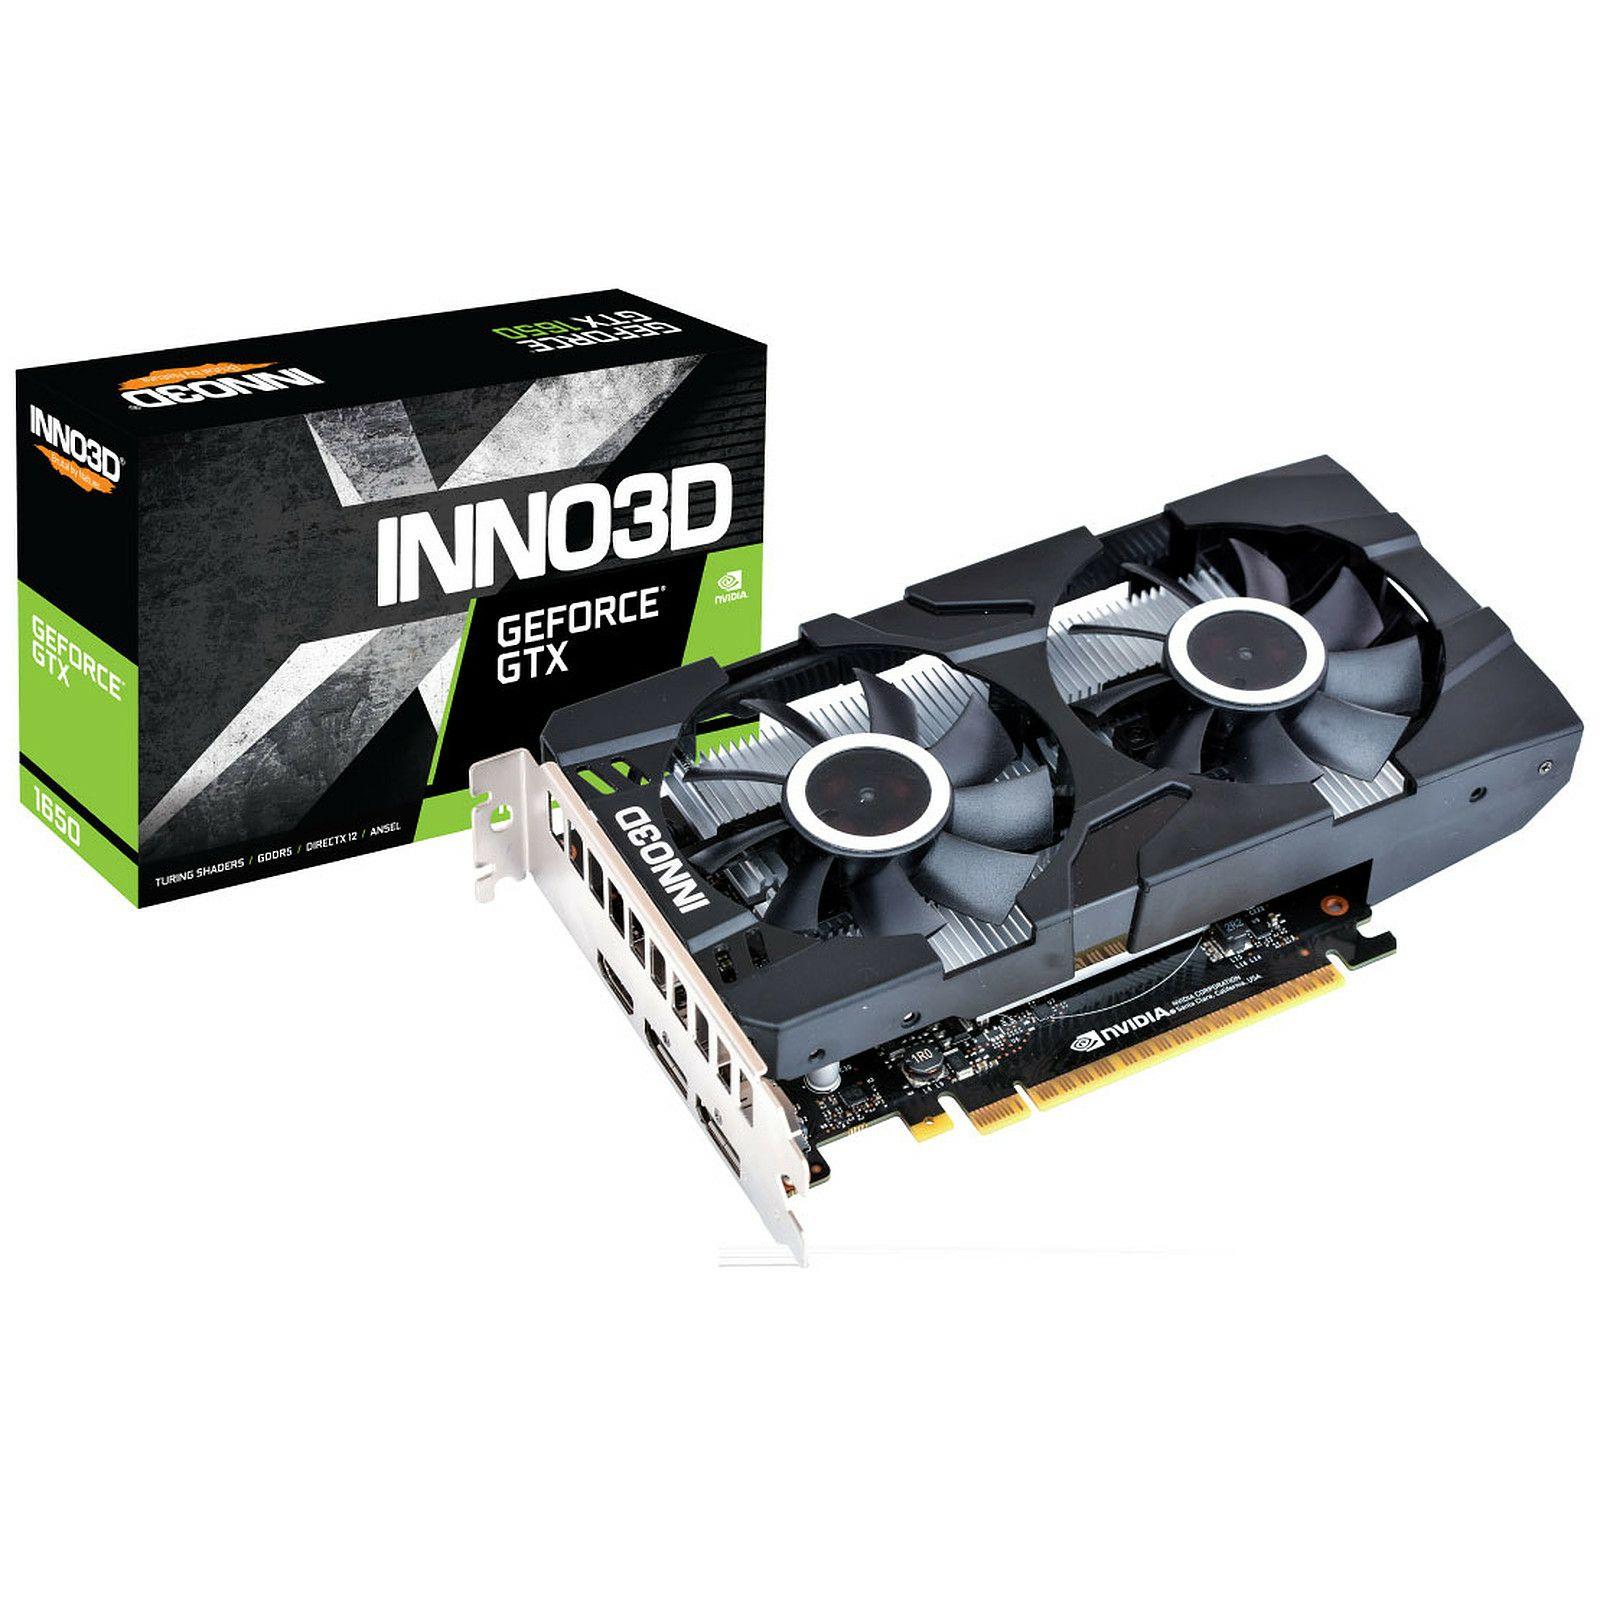 [NL Grenzgänger] Inno3D GeForce GTX 1650 Twin X2 OC 4GB GDDR5 Grafikkarte DP/HDMI